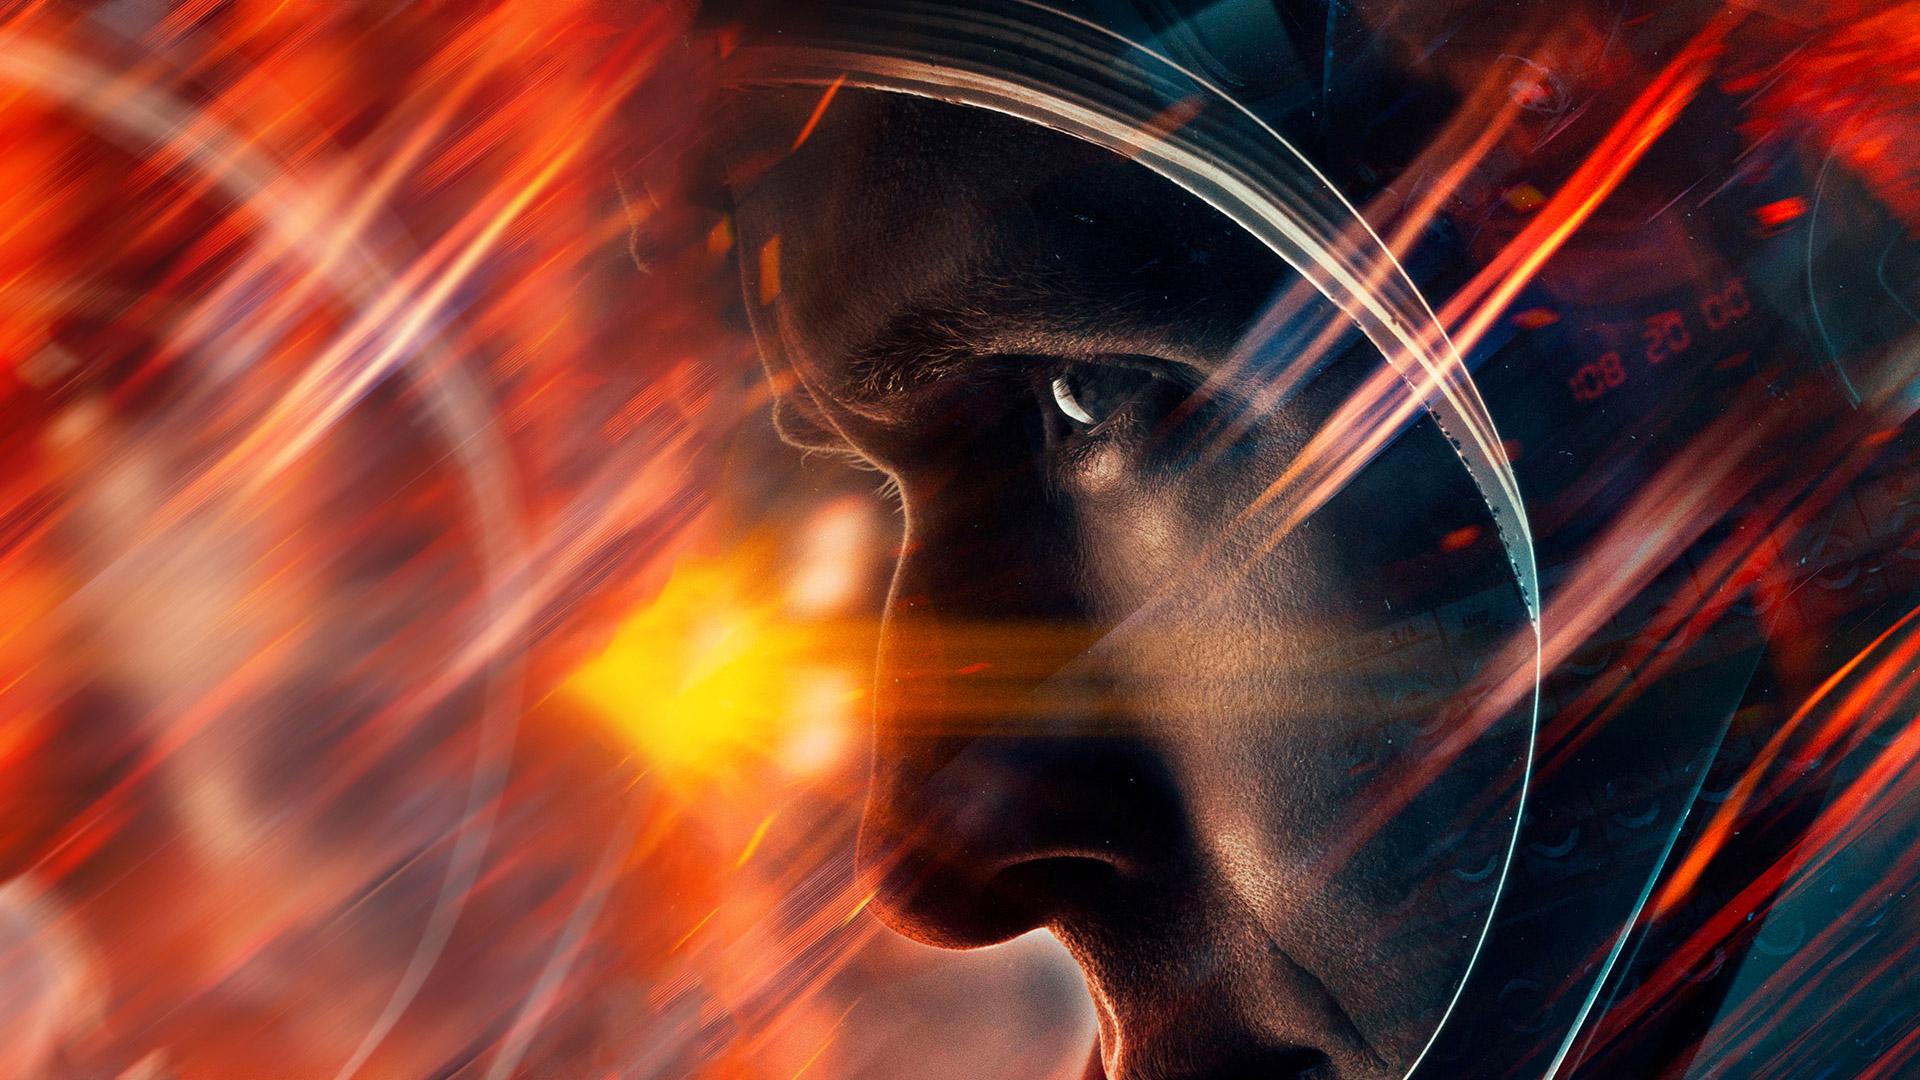 Code movie space trailer